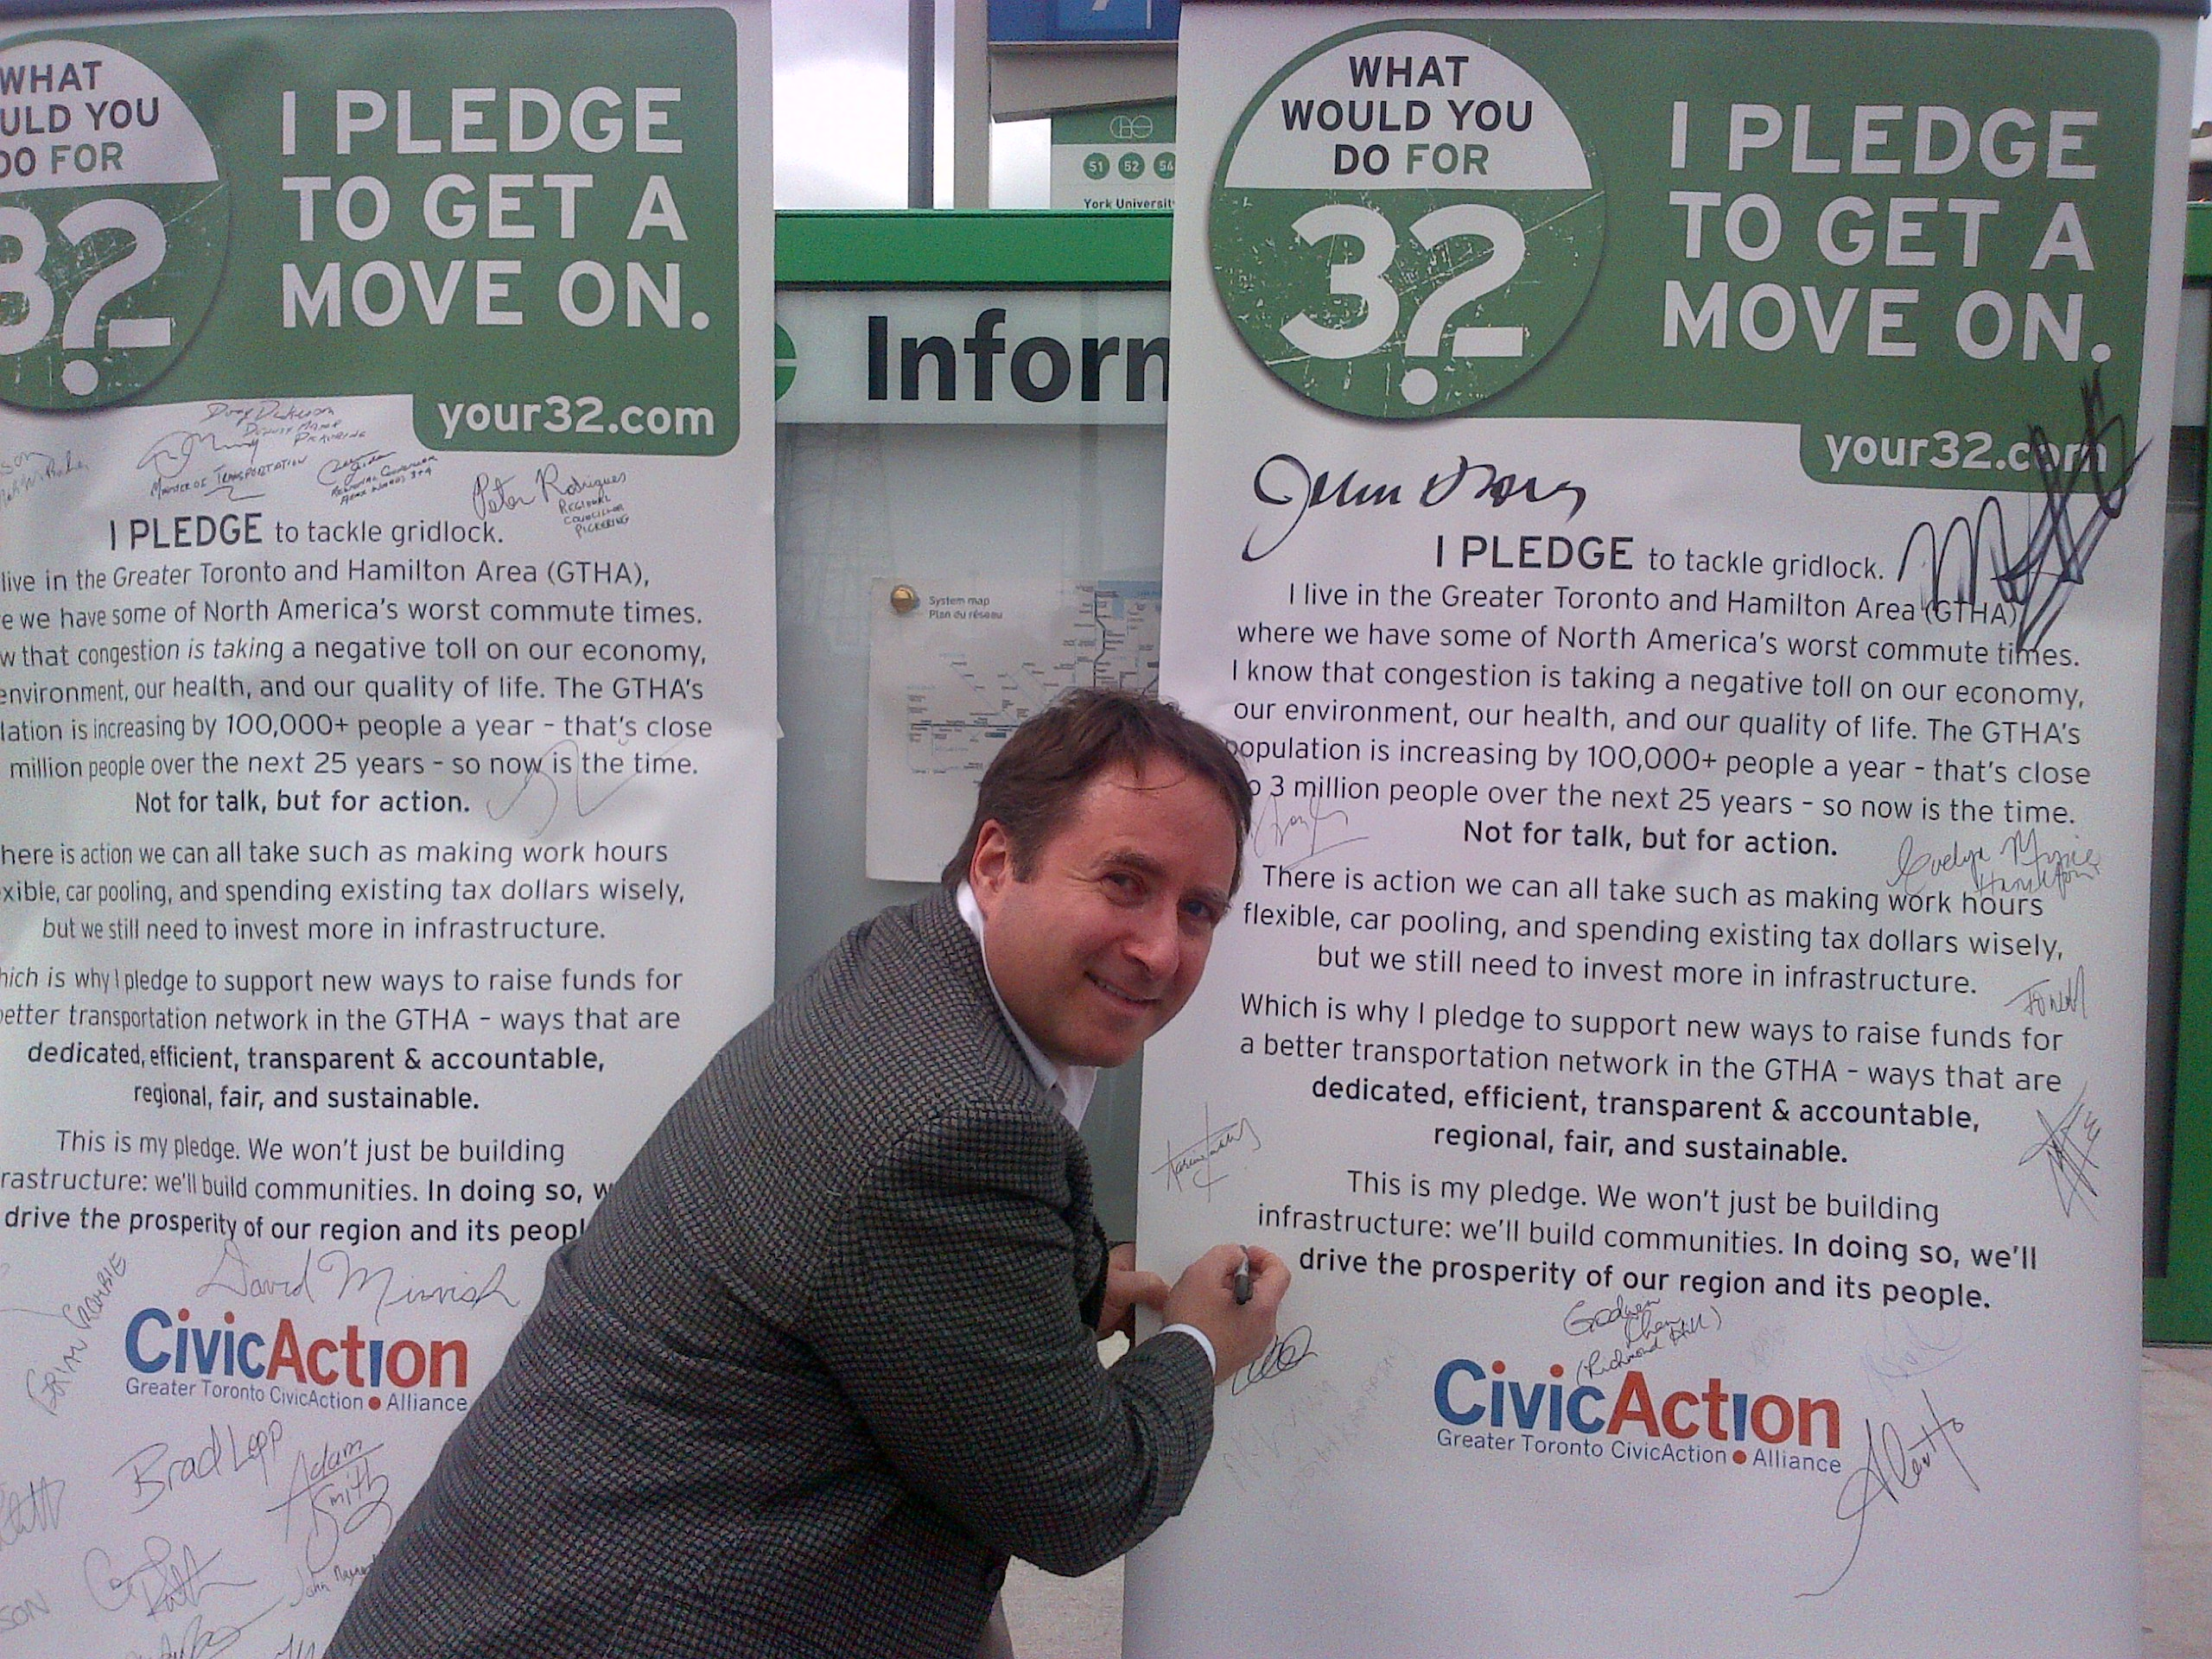 Civic_Action.jpg